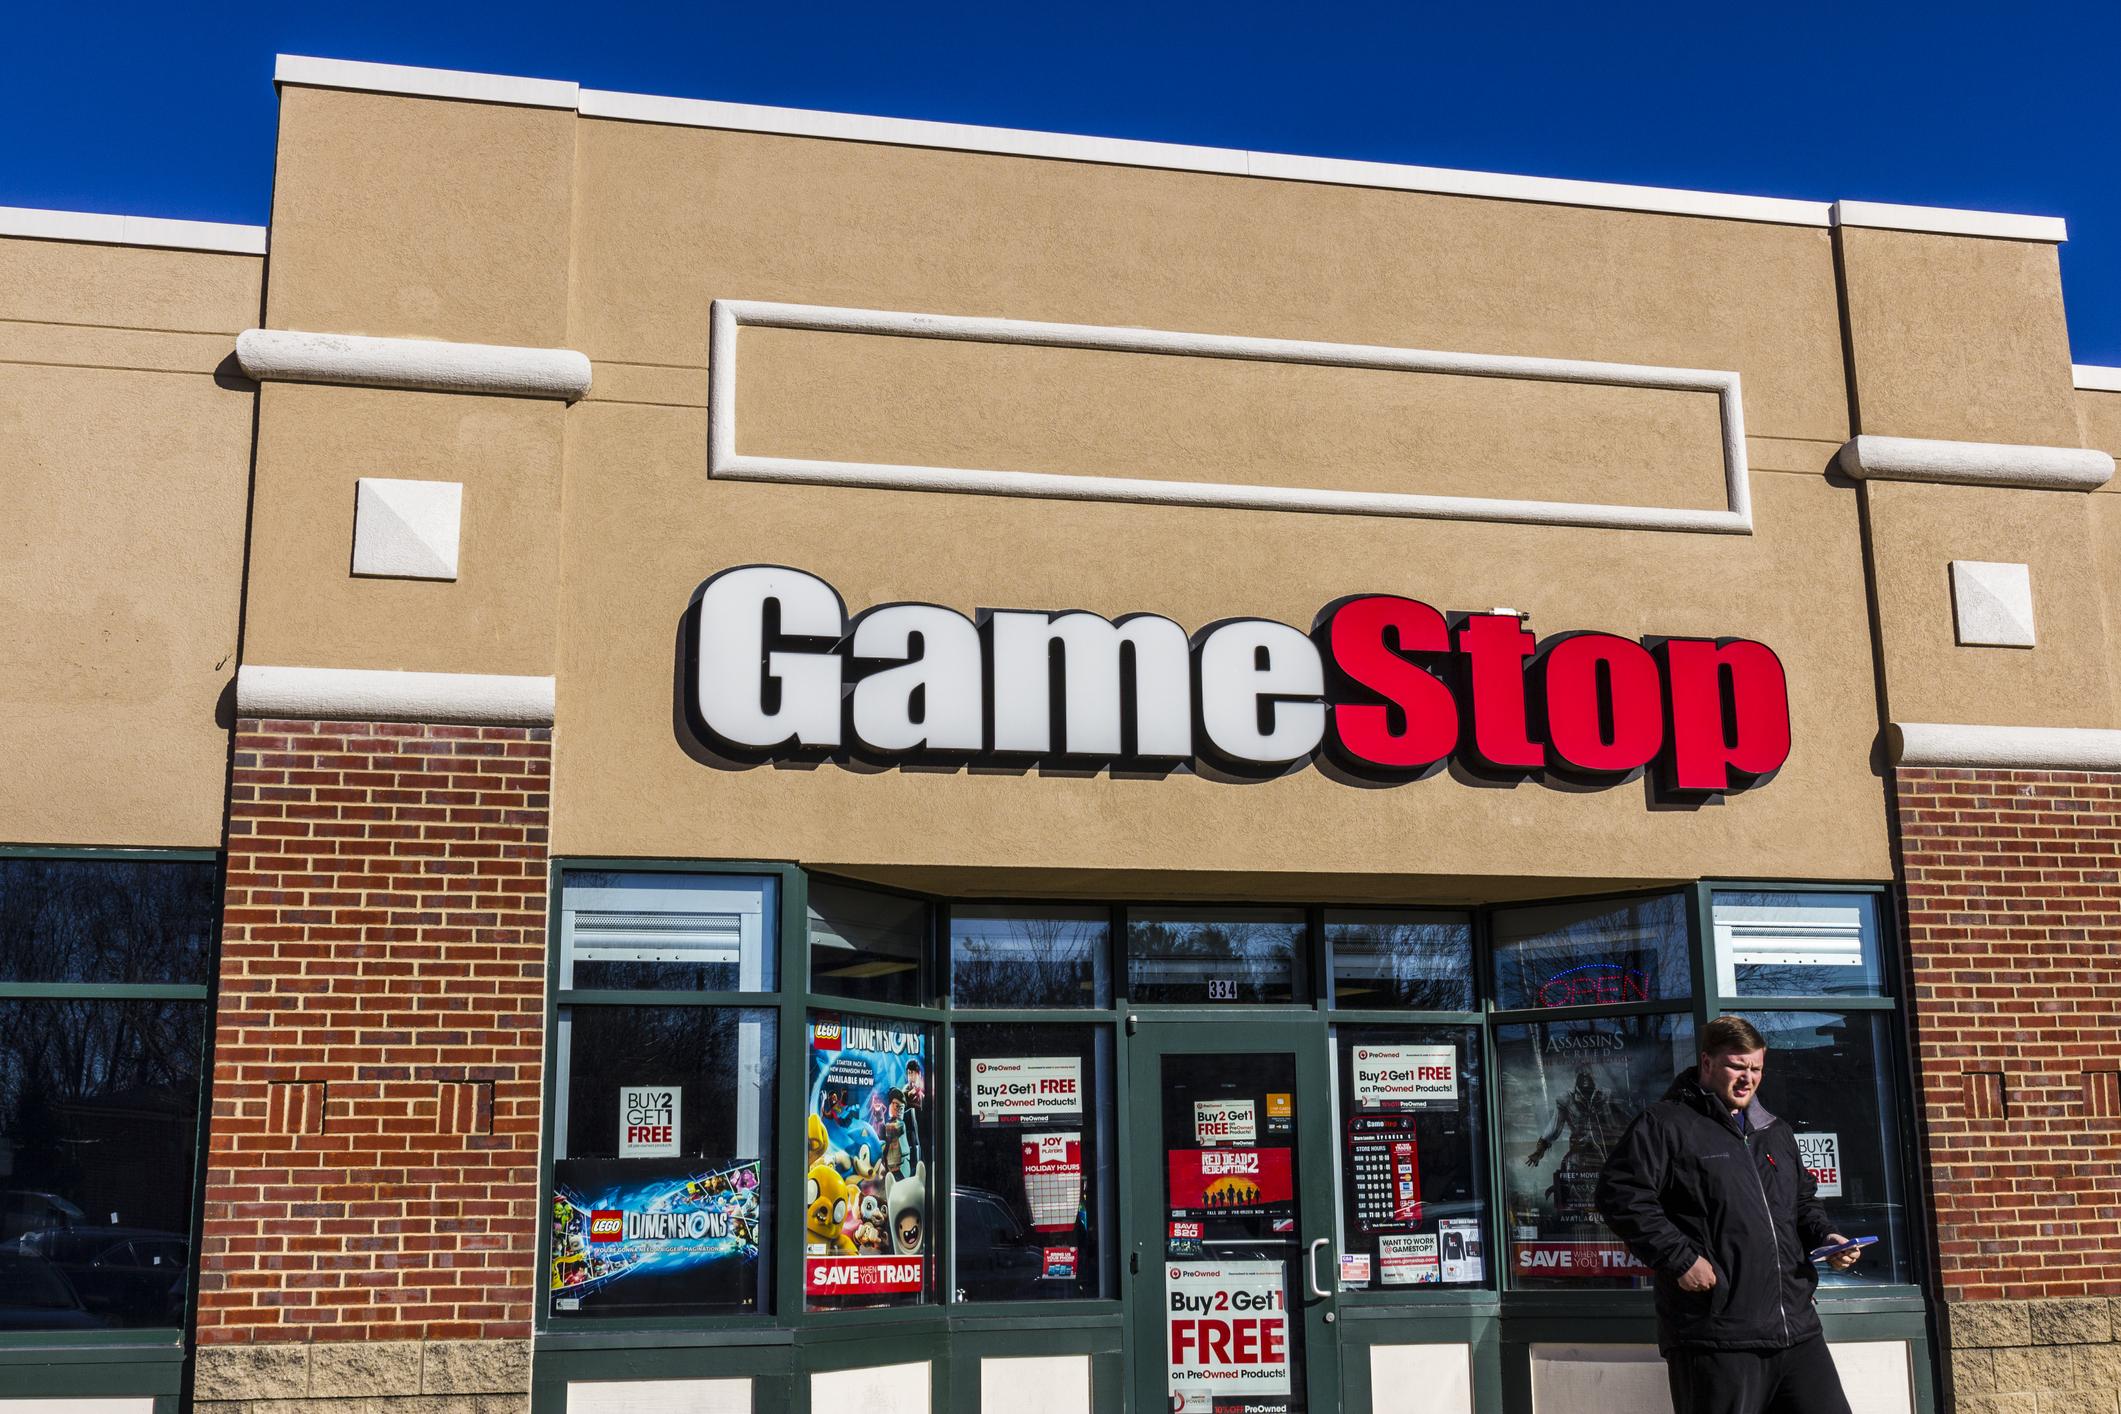 exterior of GameStop store